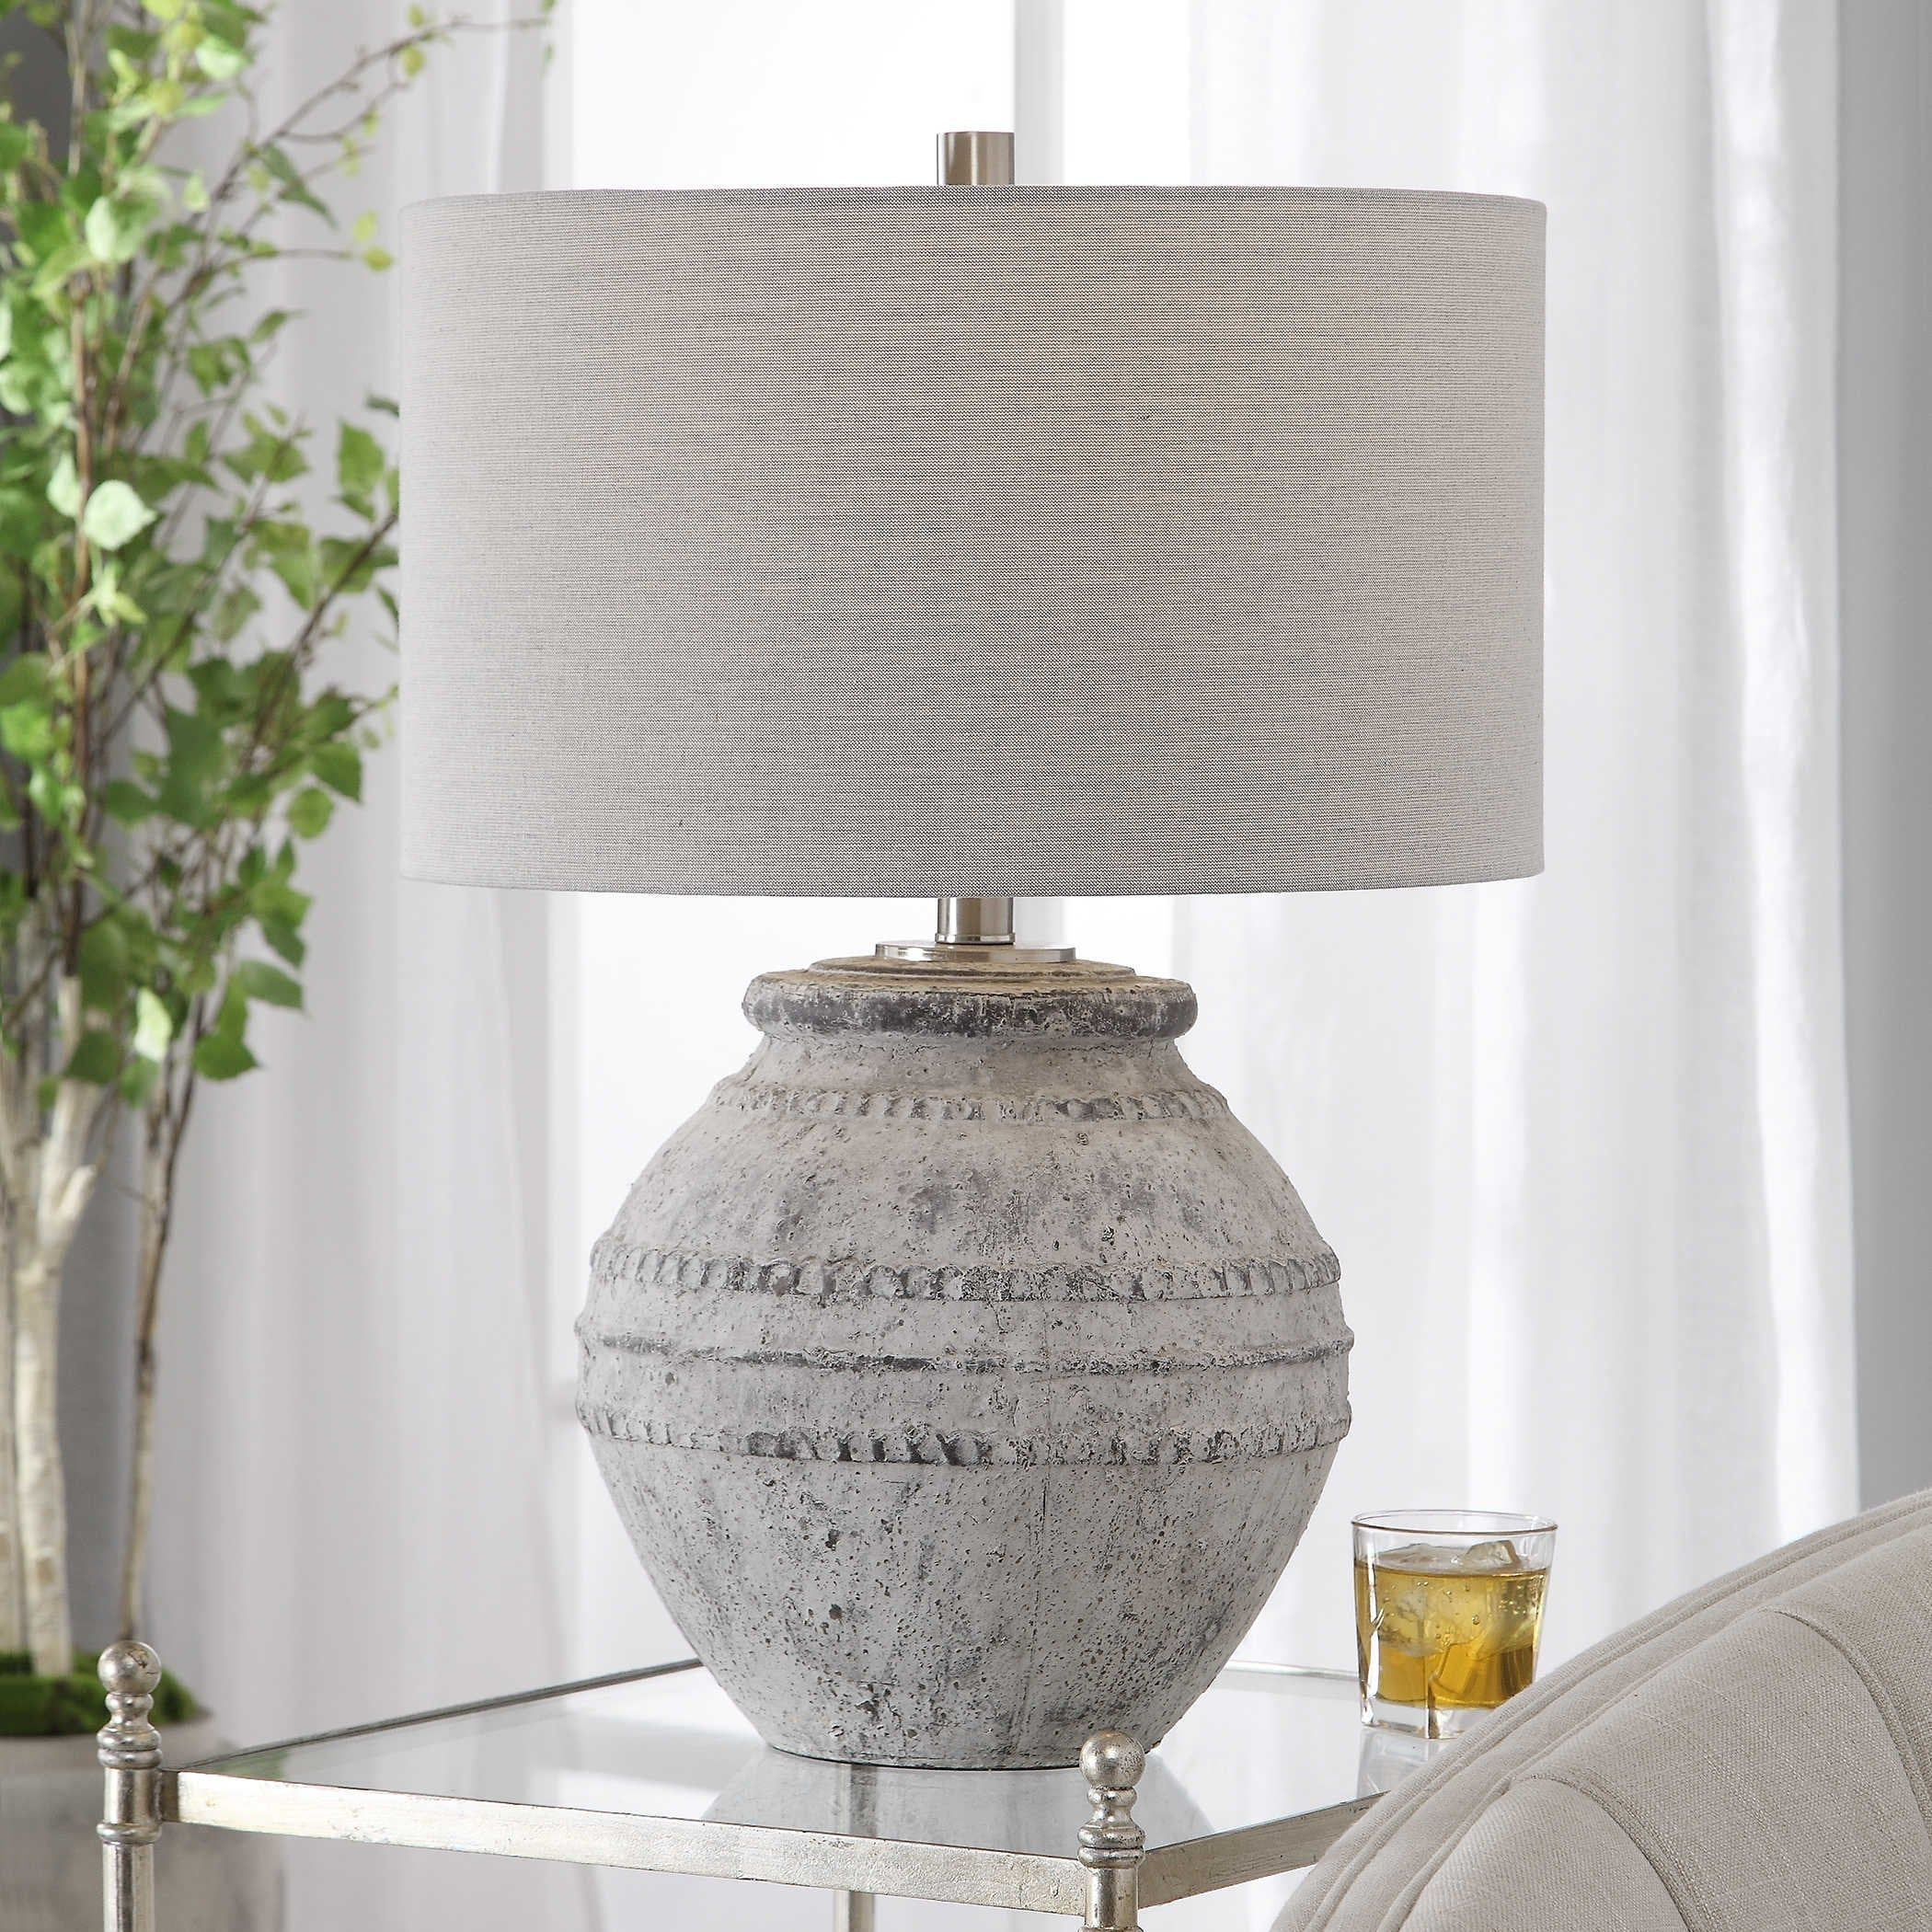 Marius Table Lamp Etsy In 2020 Ceramic Table Lamps Table Lamps Living Room Ceramic Table